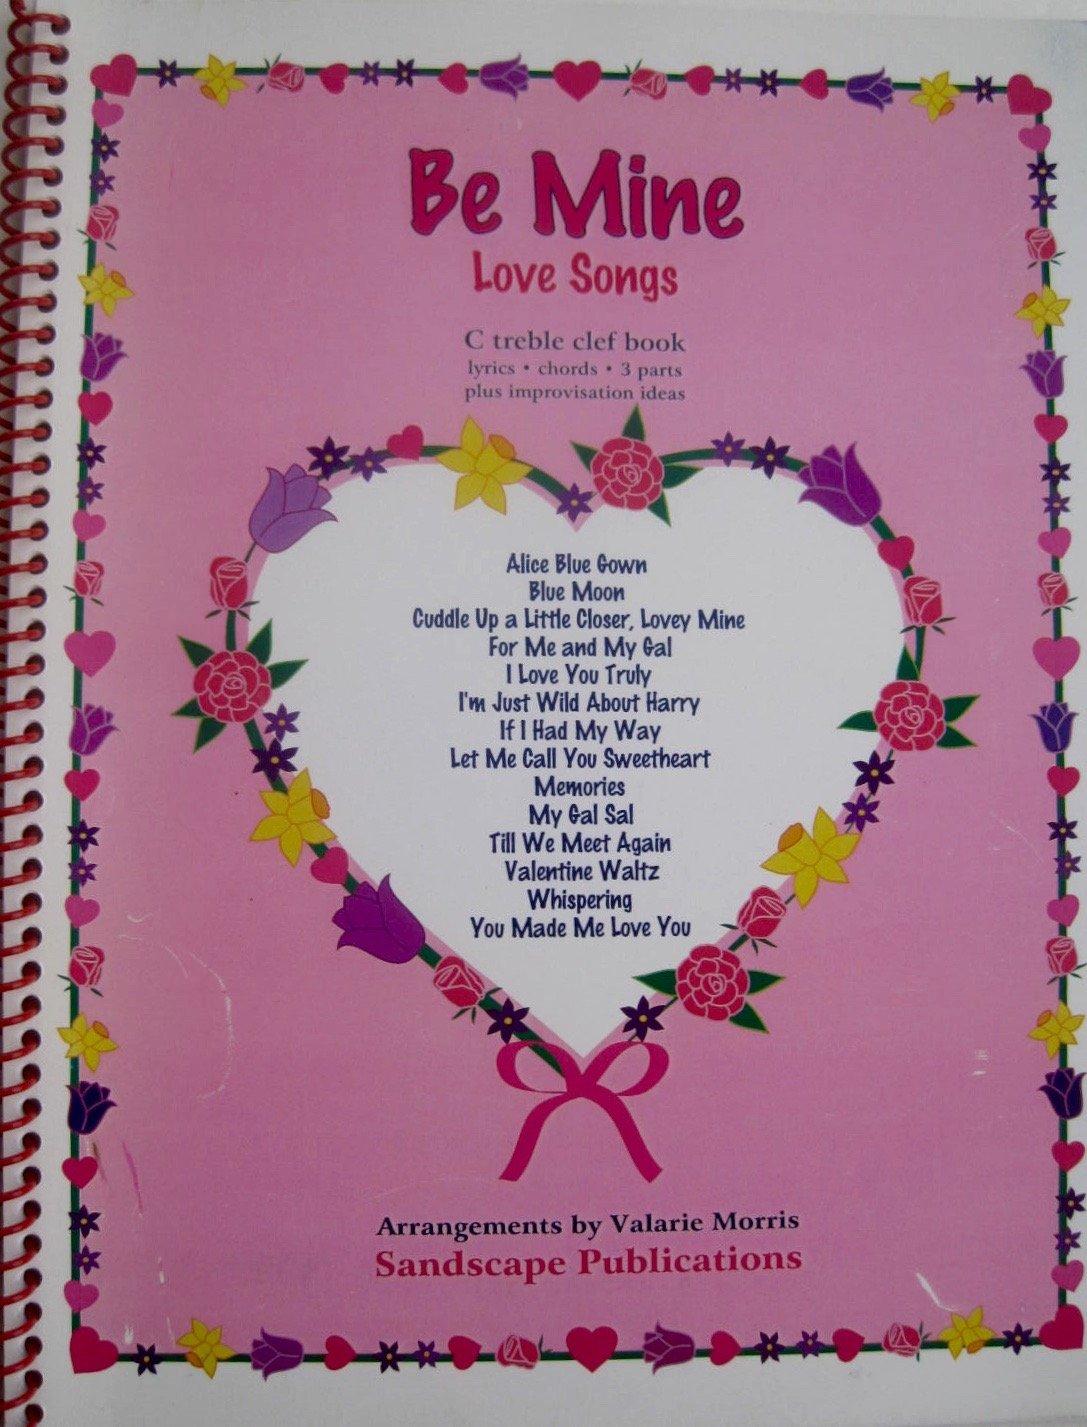 Be Mine Love Songs: C Treble Clef Book (Lyrics/Chords/3 Parts/Plus ...